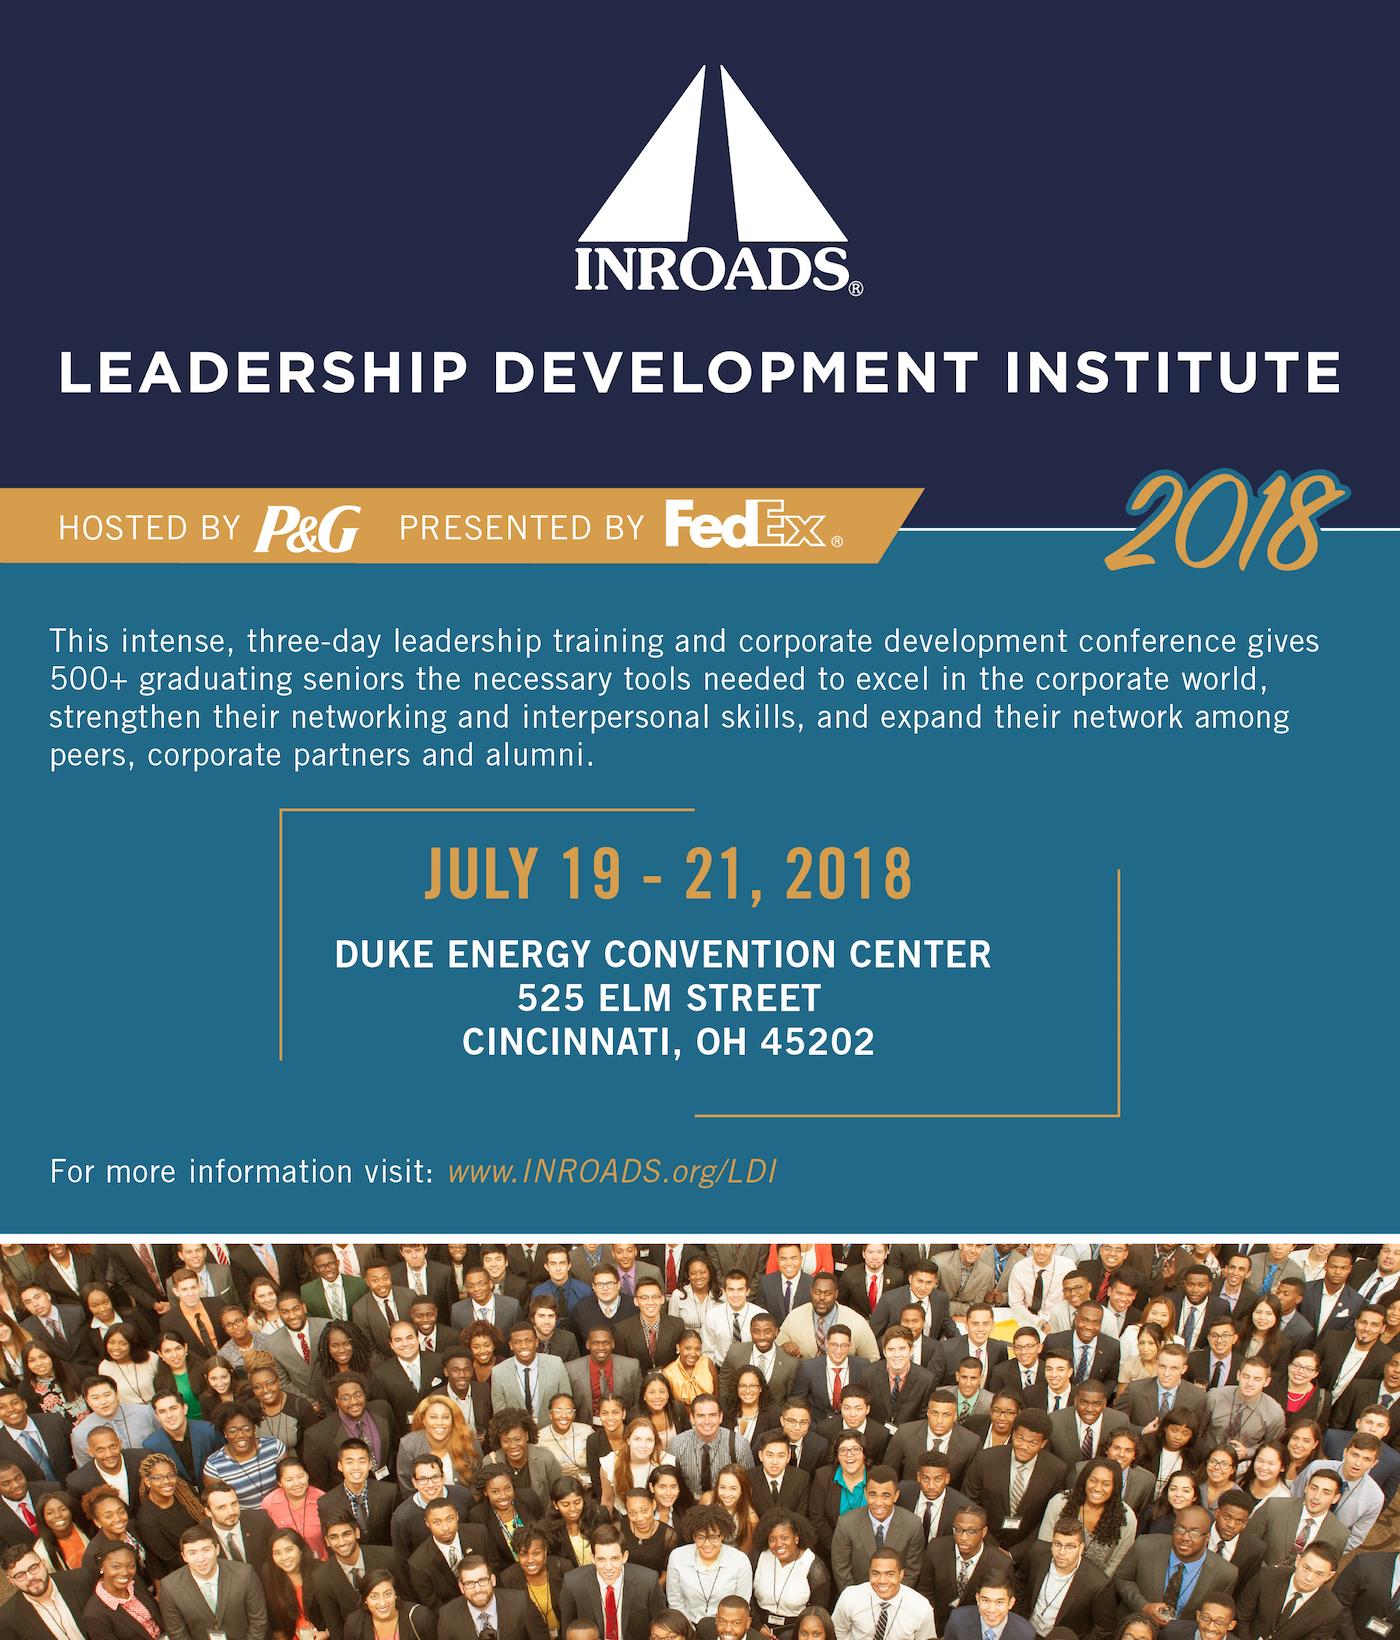 National Leadership Development Institute Inroads